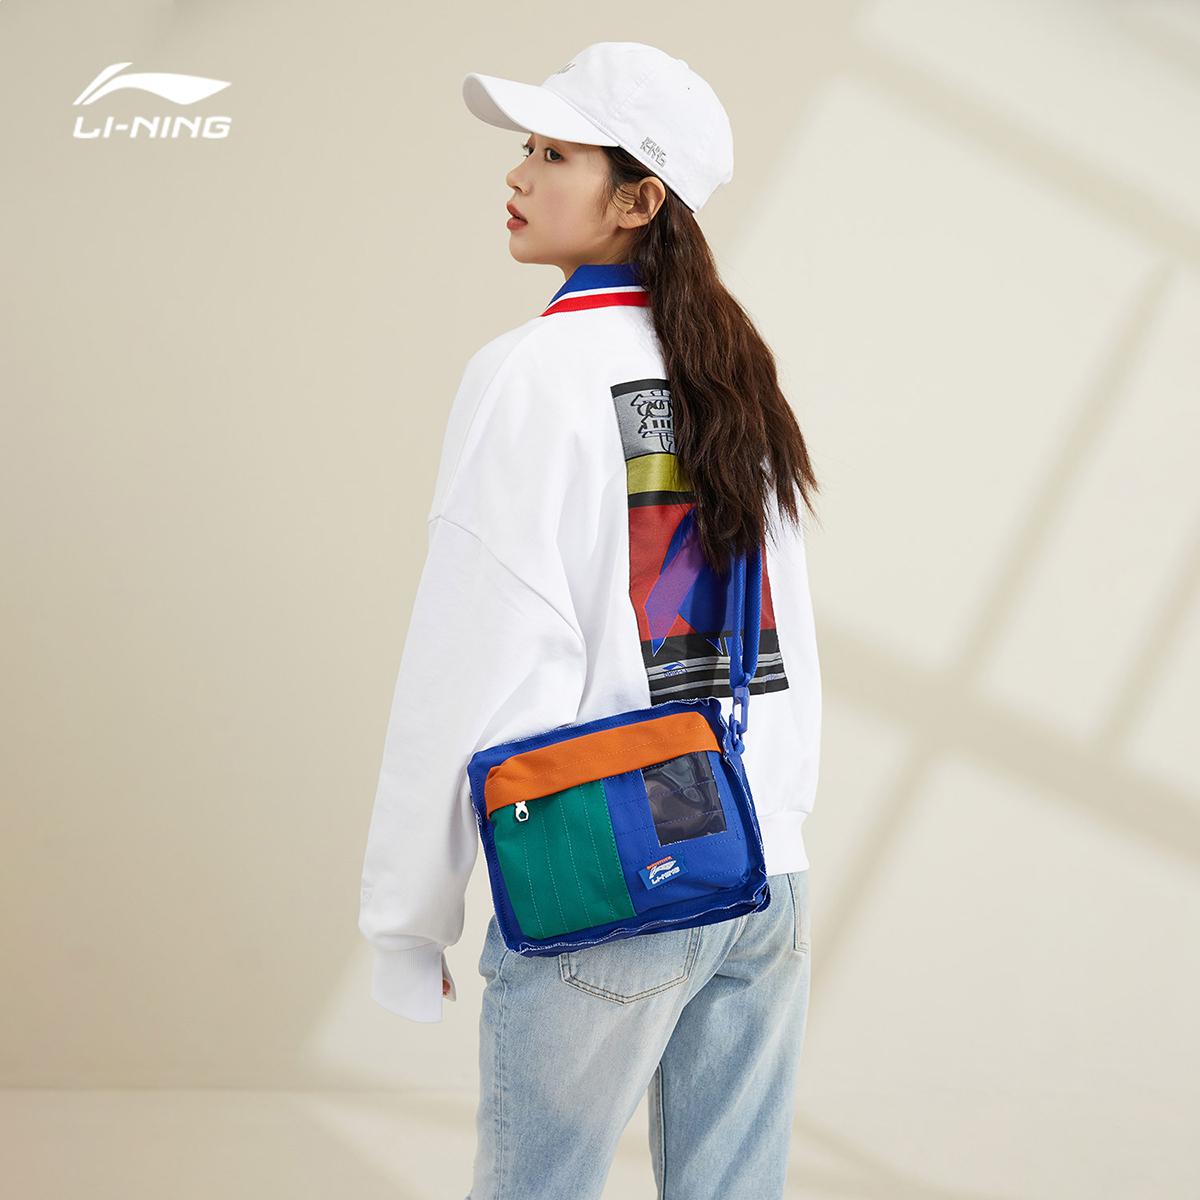 China Li Ning slant bag mens bag womens bag 2021 spring new sports bag ABDR048